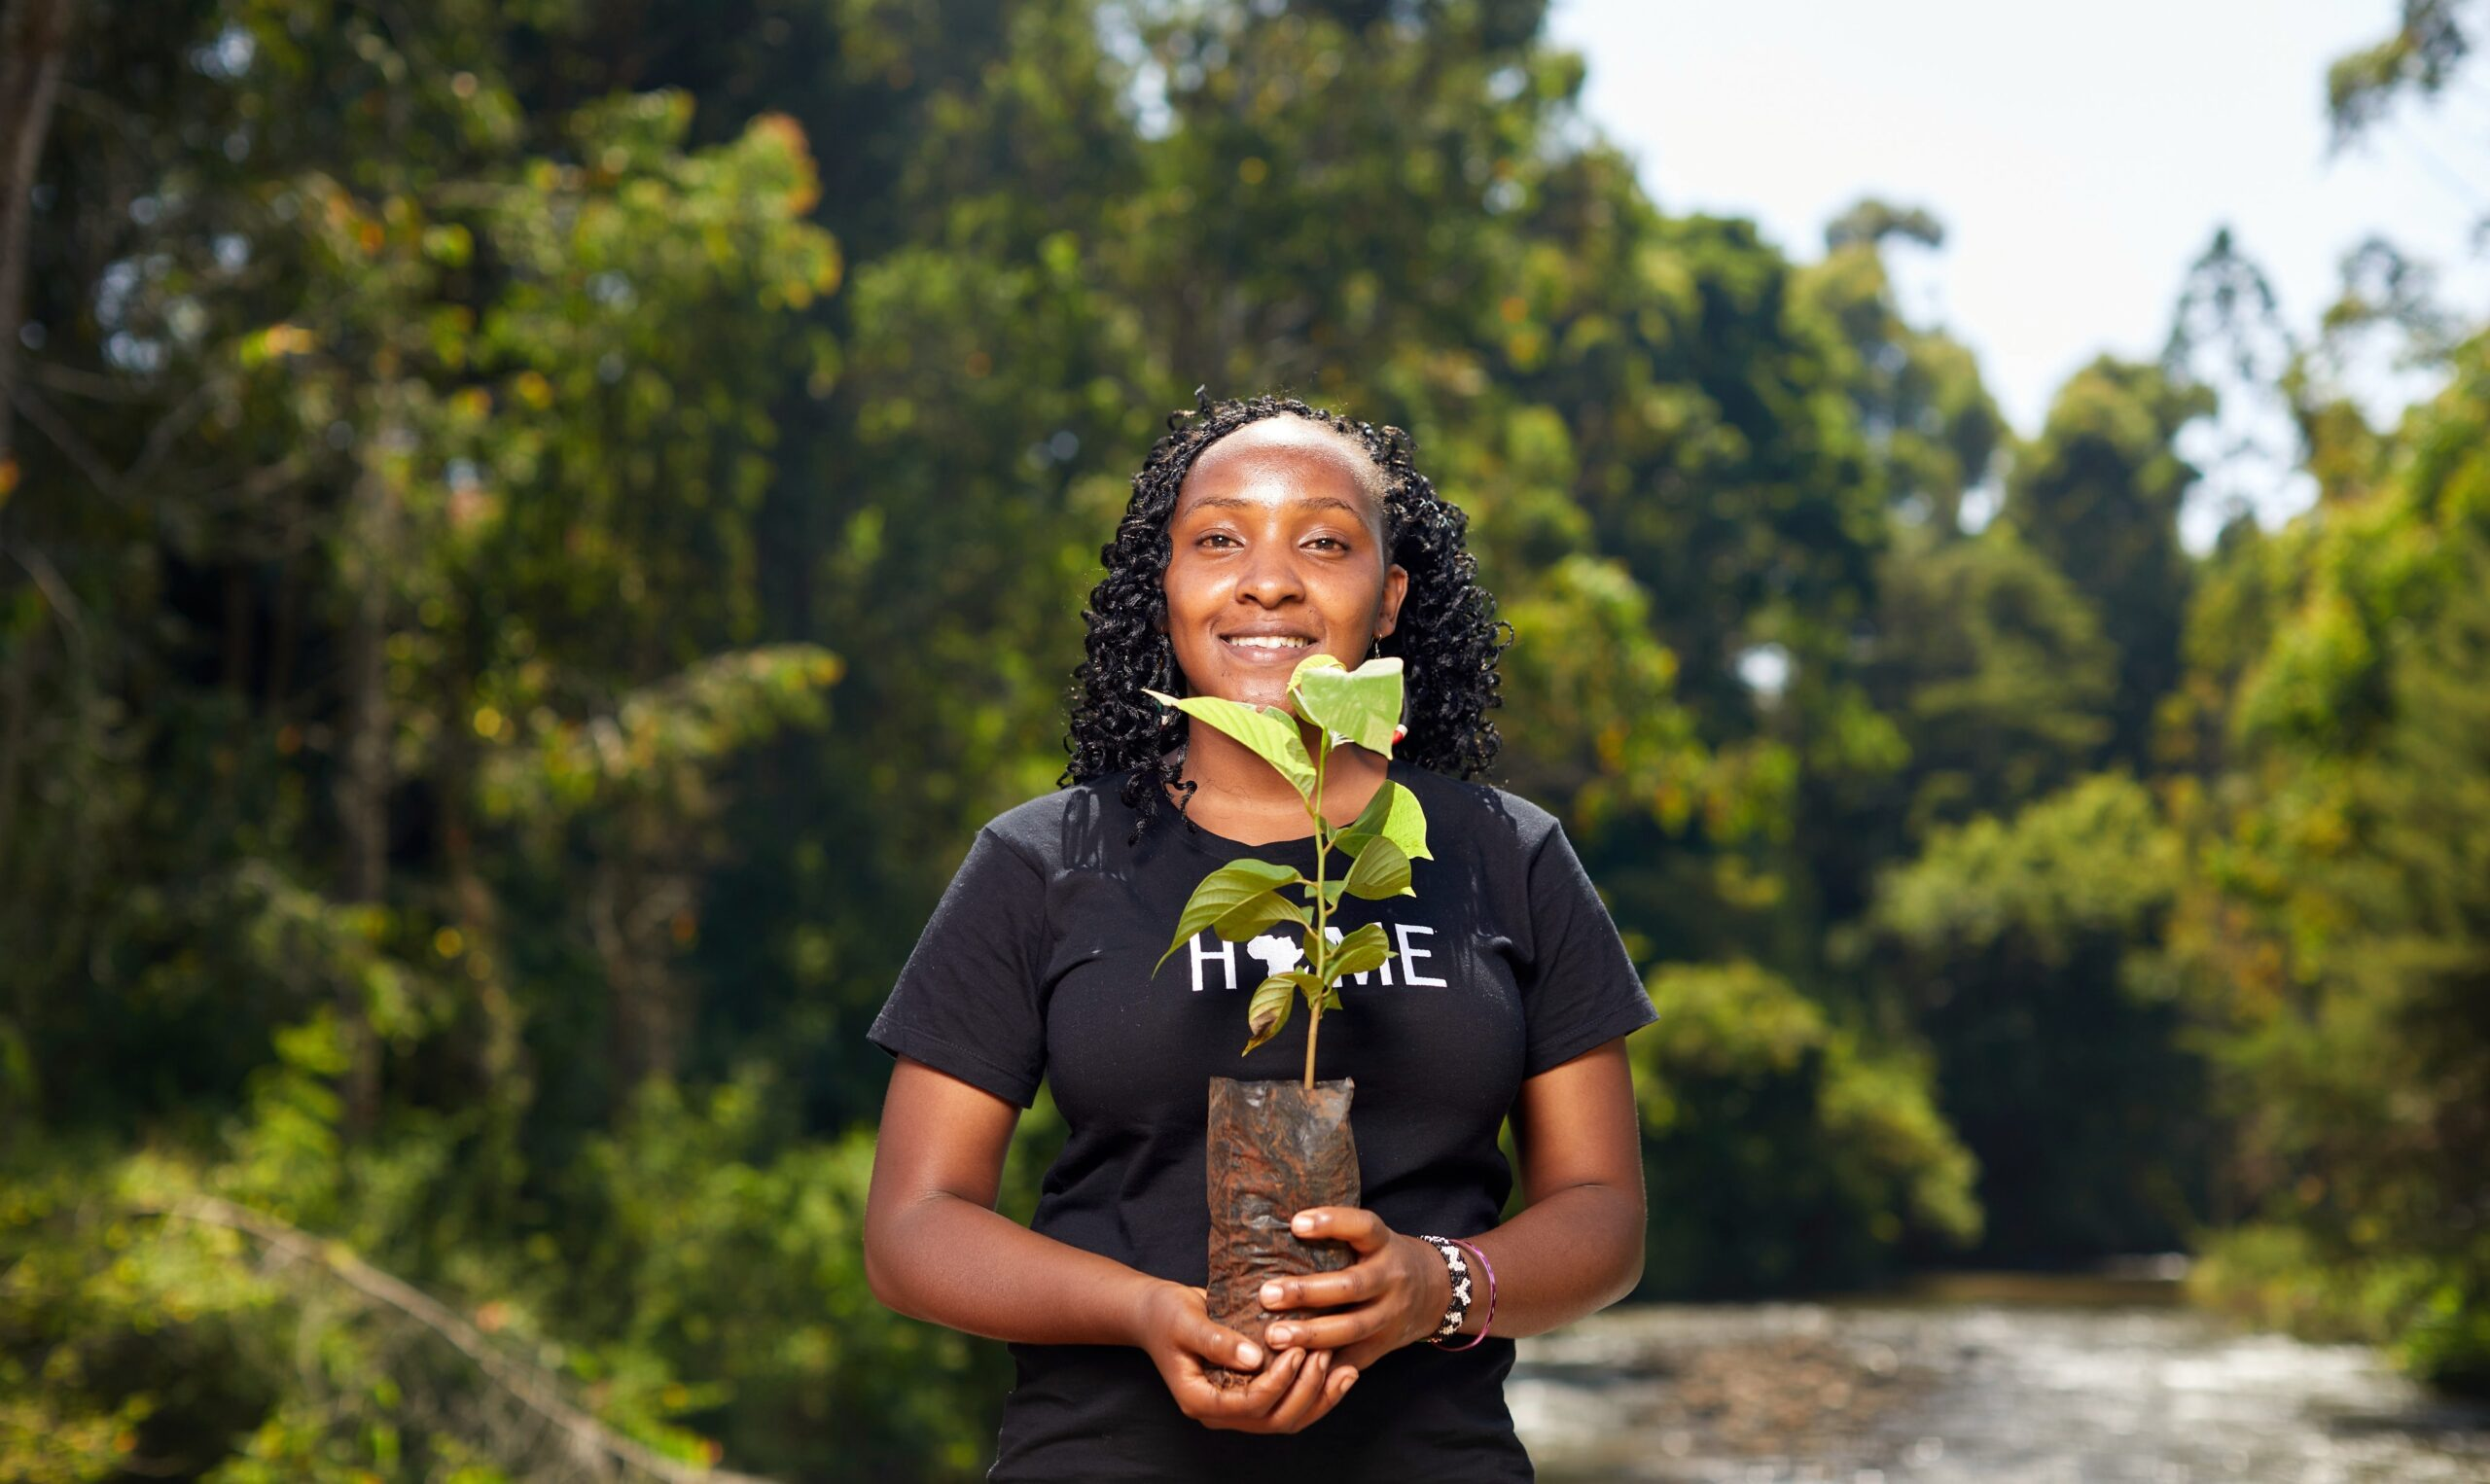 Elizabeth Wanjiru Wathuti